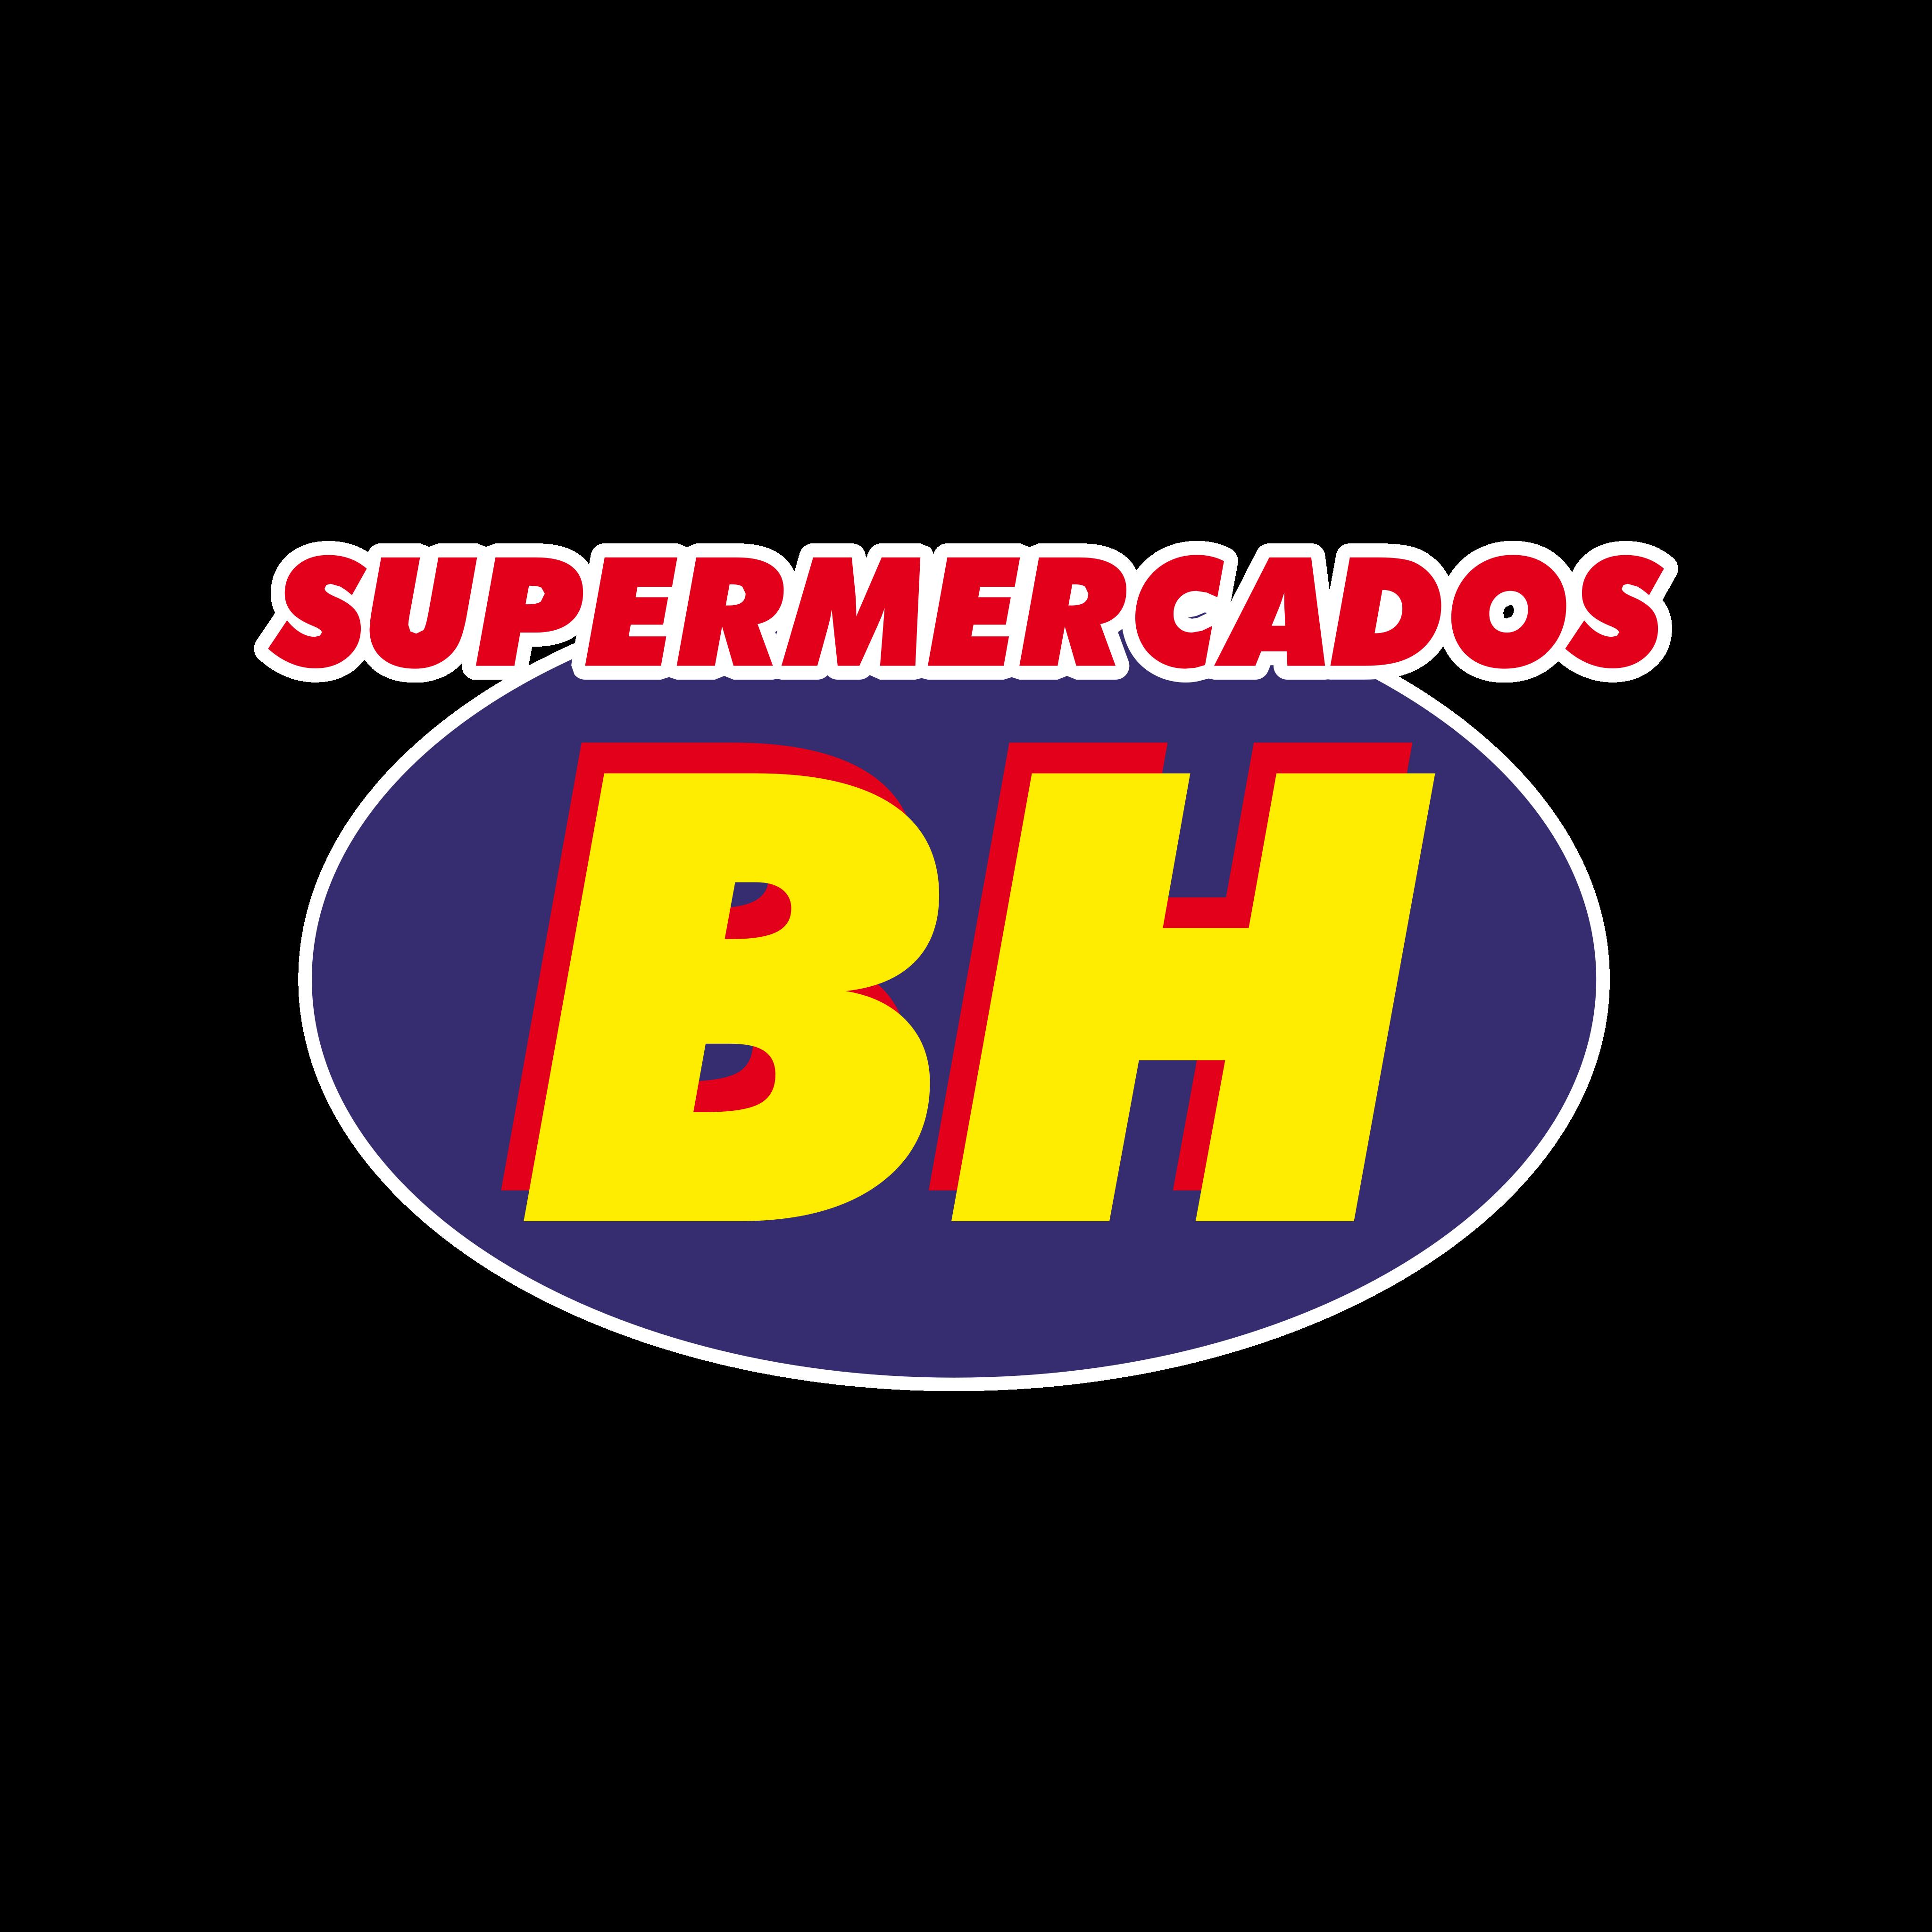 supermercados bh logo 0 - Supermercados BH Logo